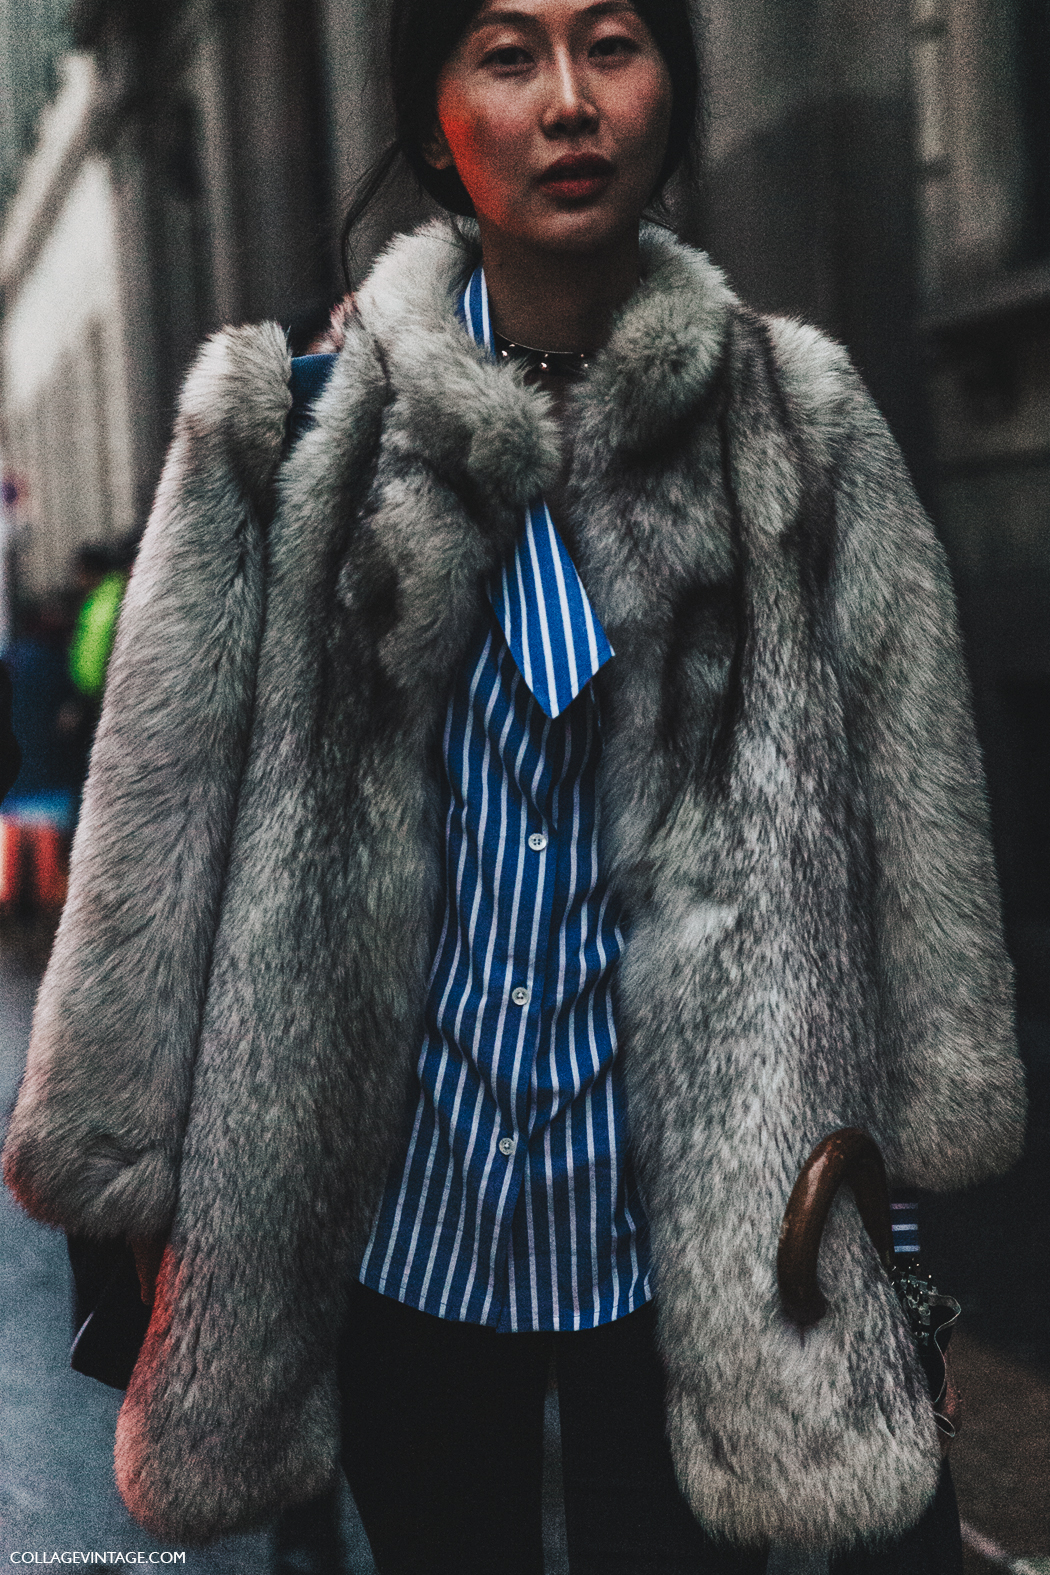 Milan_Fashion_Week_Fall_16-MFW-Street_Style-Collage_Vintage-Striped_Blouse-Fur_Coat-